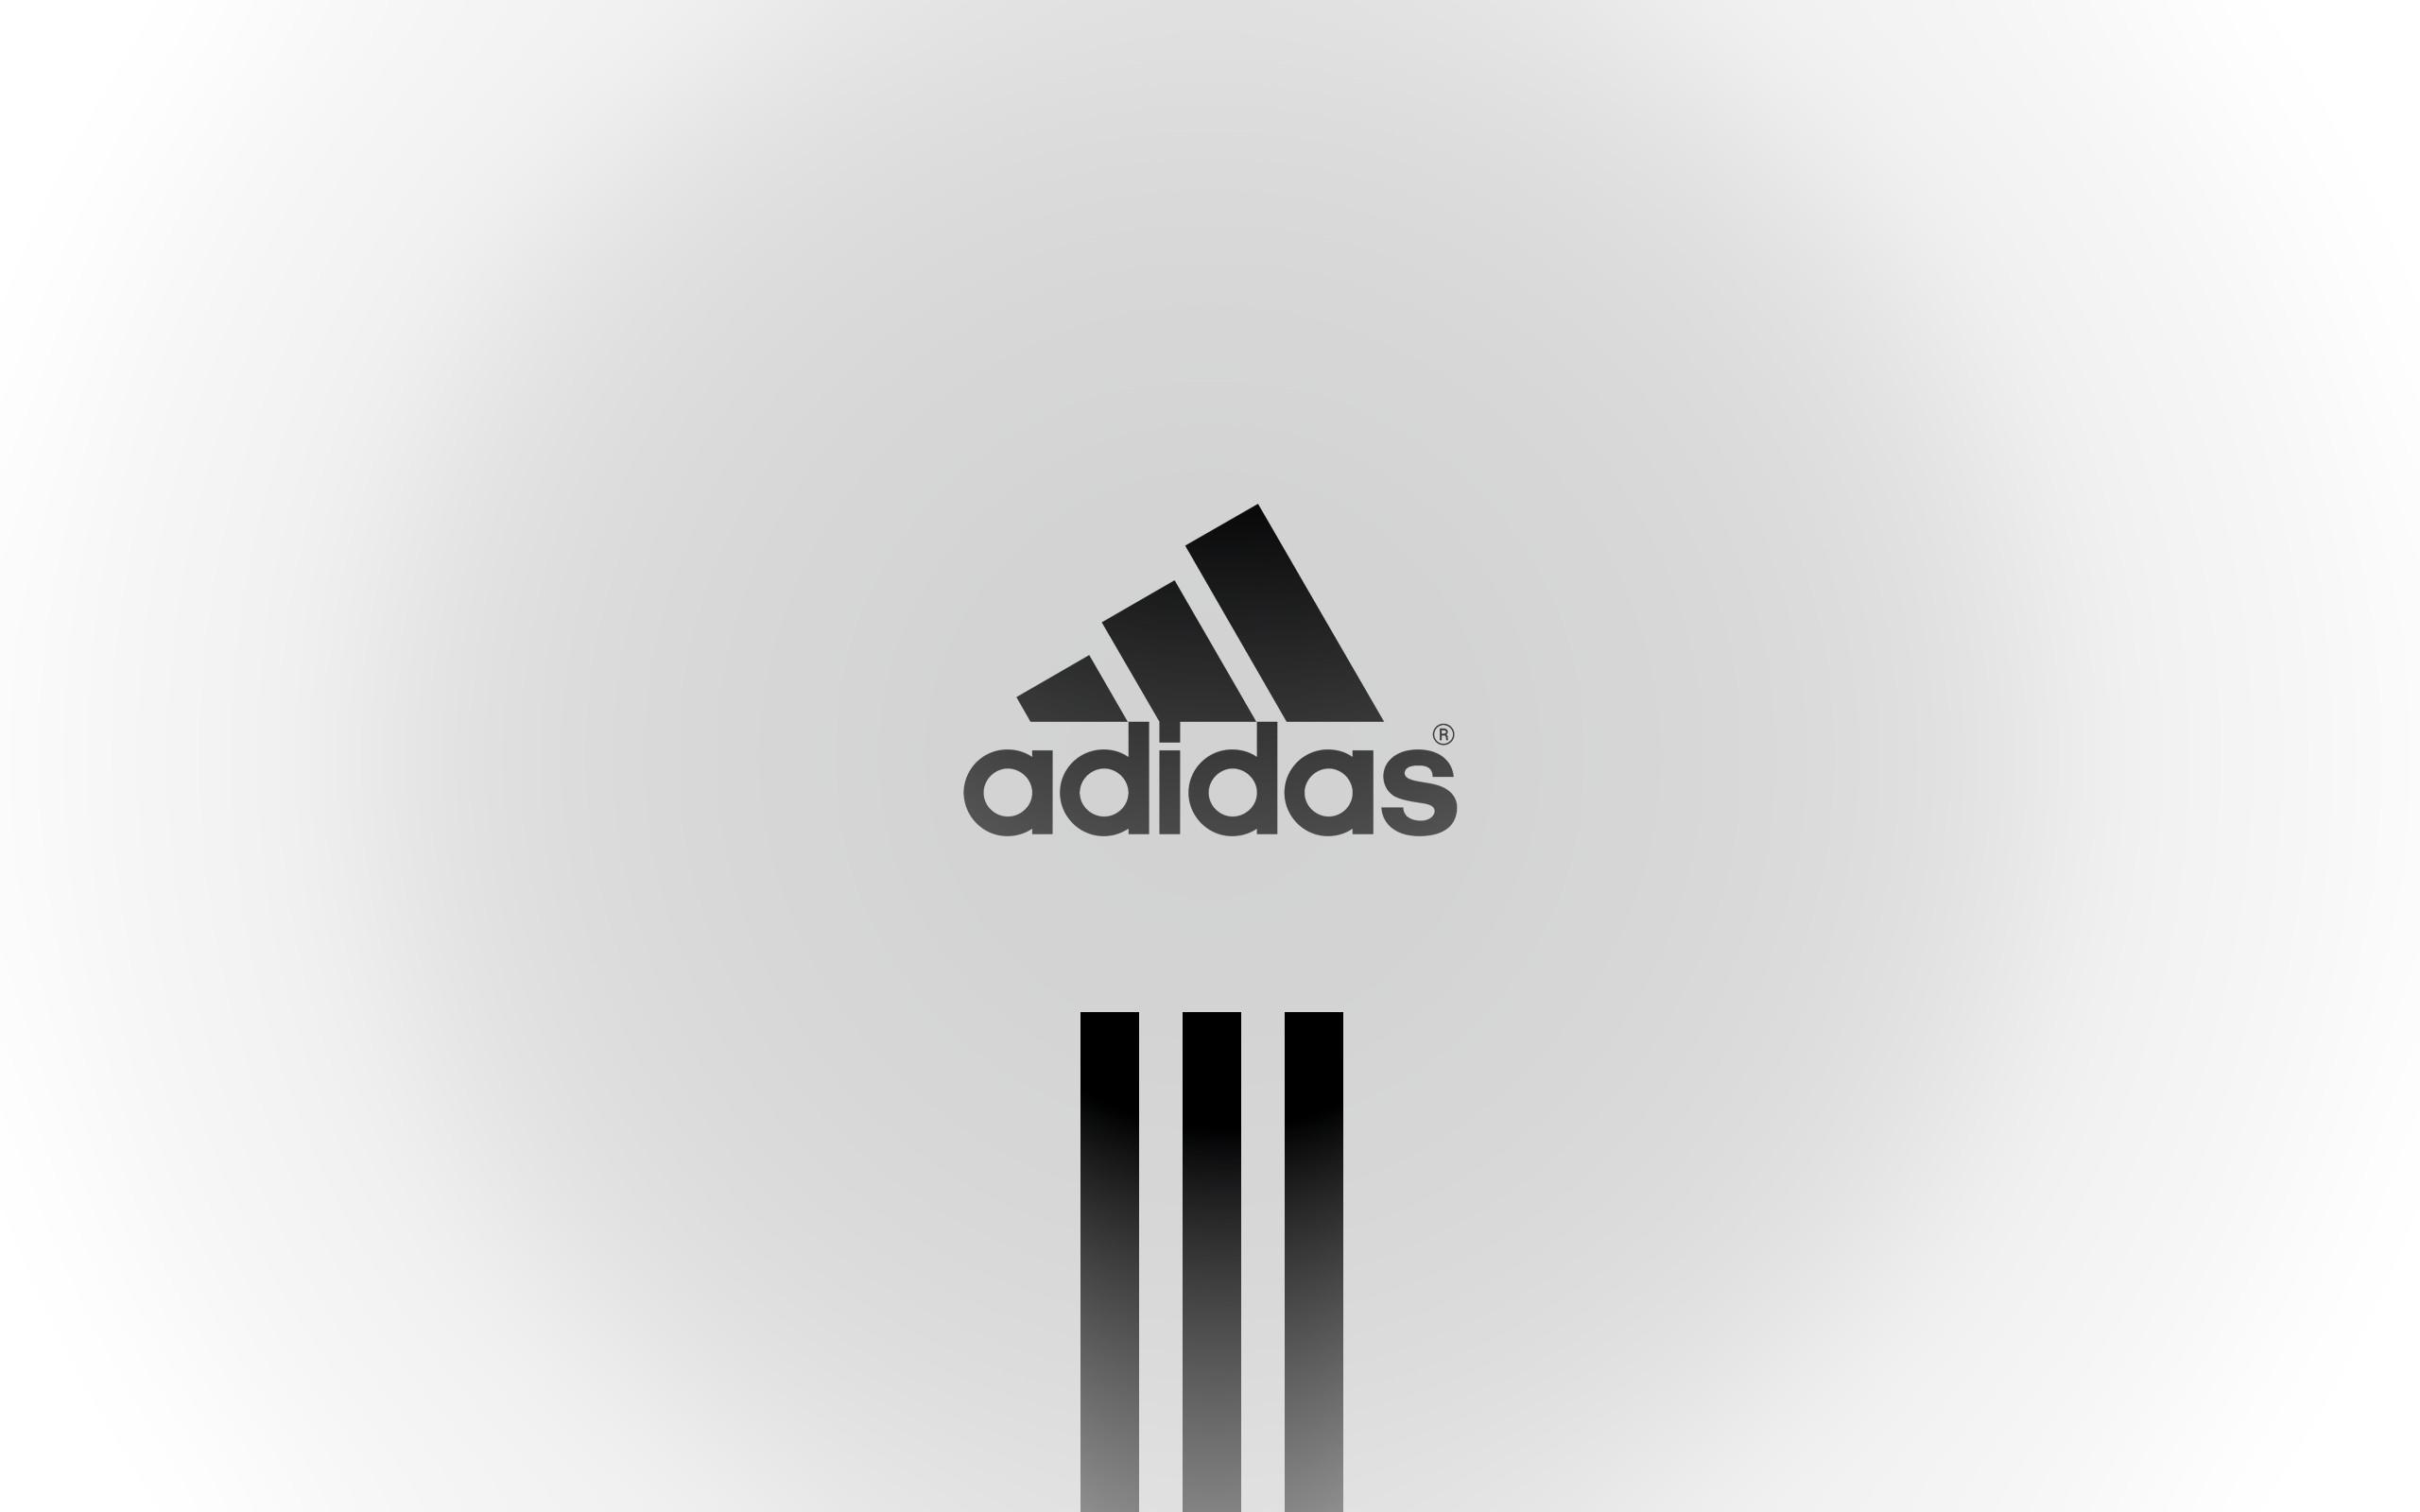 2560x1600 New HD Adidas Logo Wallpaper-2